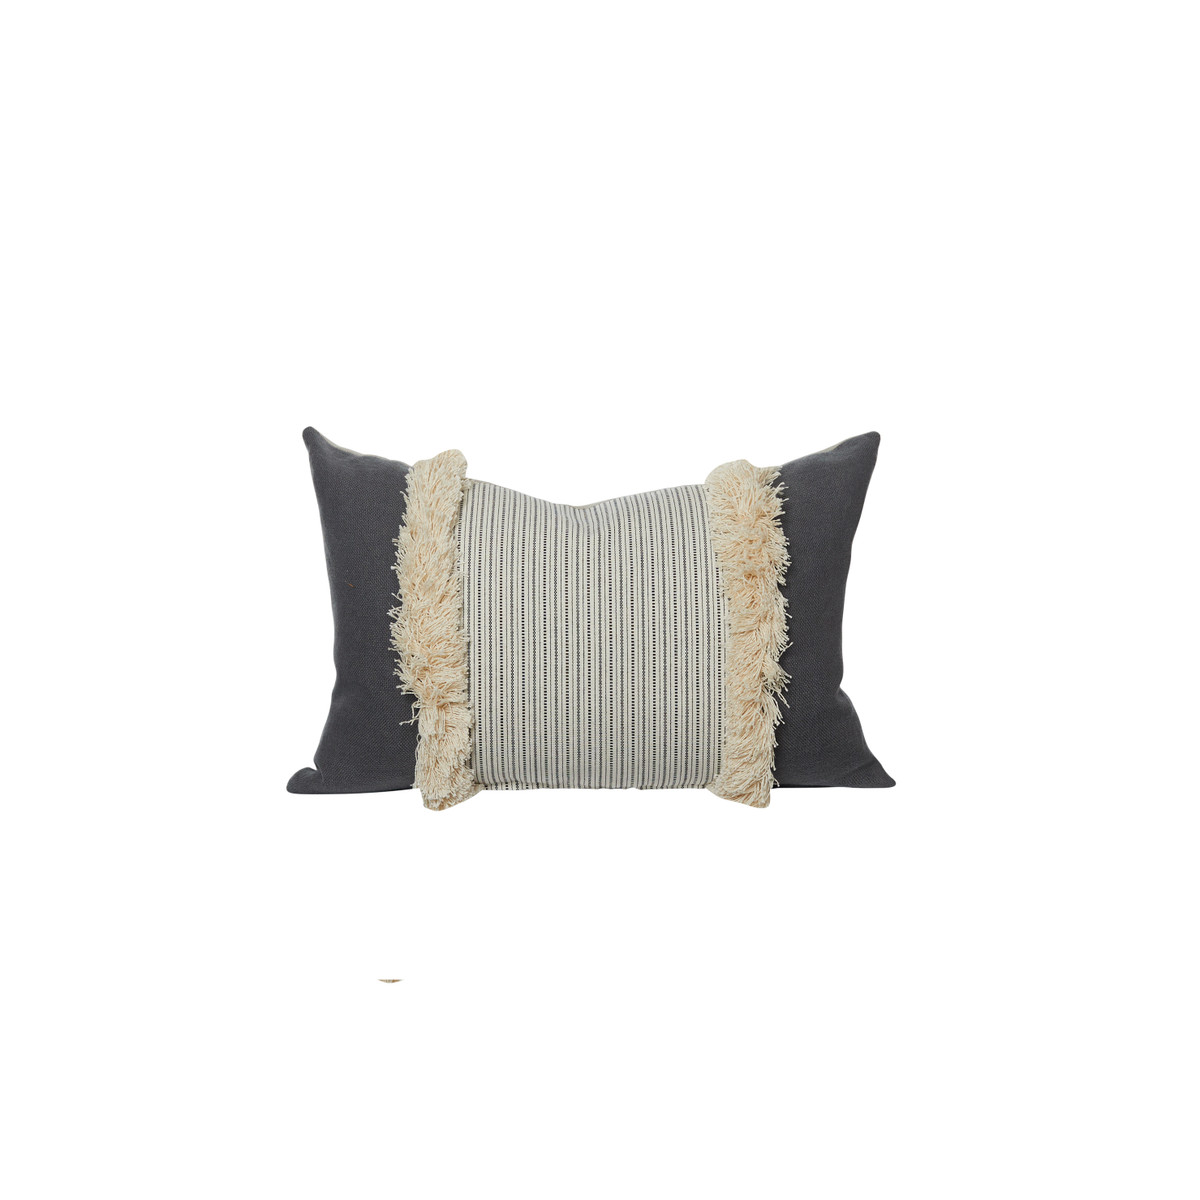 Tera Gray Linen Stripe Fringe Lumbar Pillow - Front